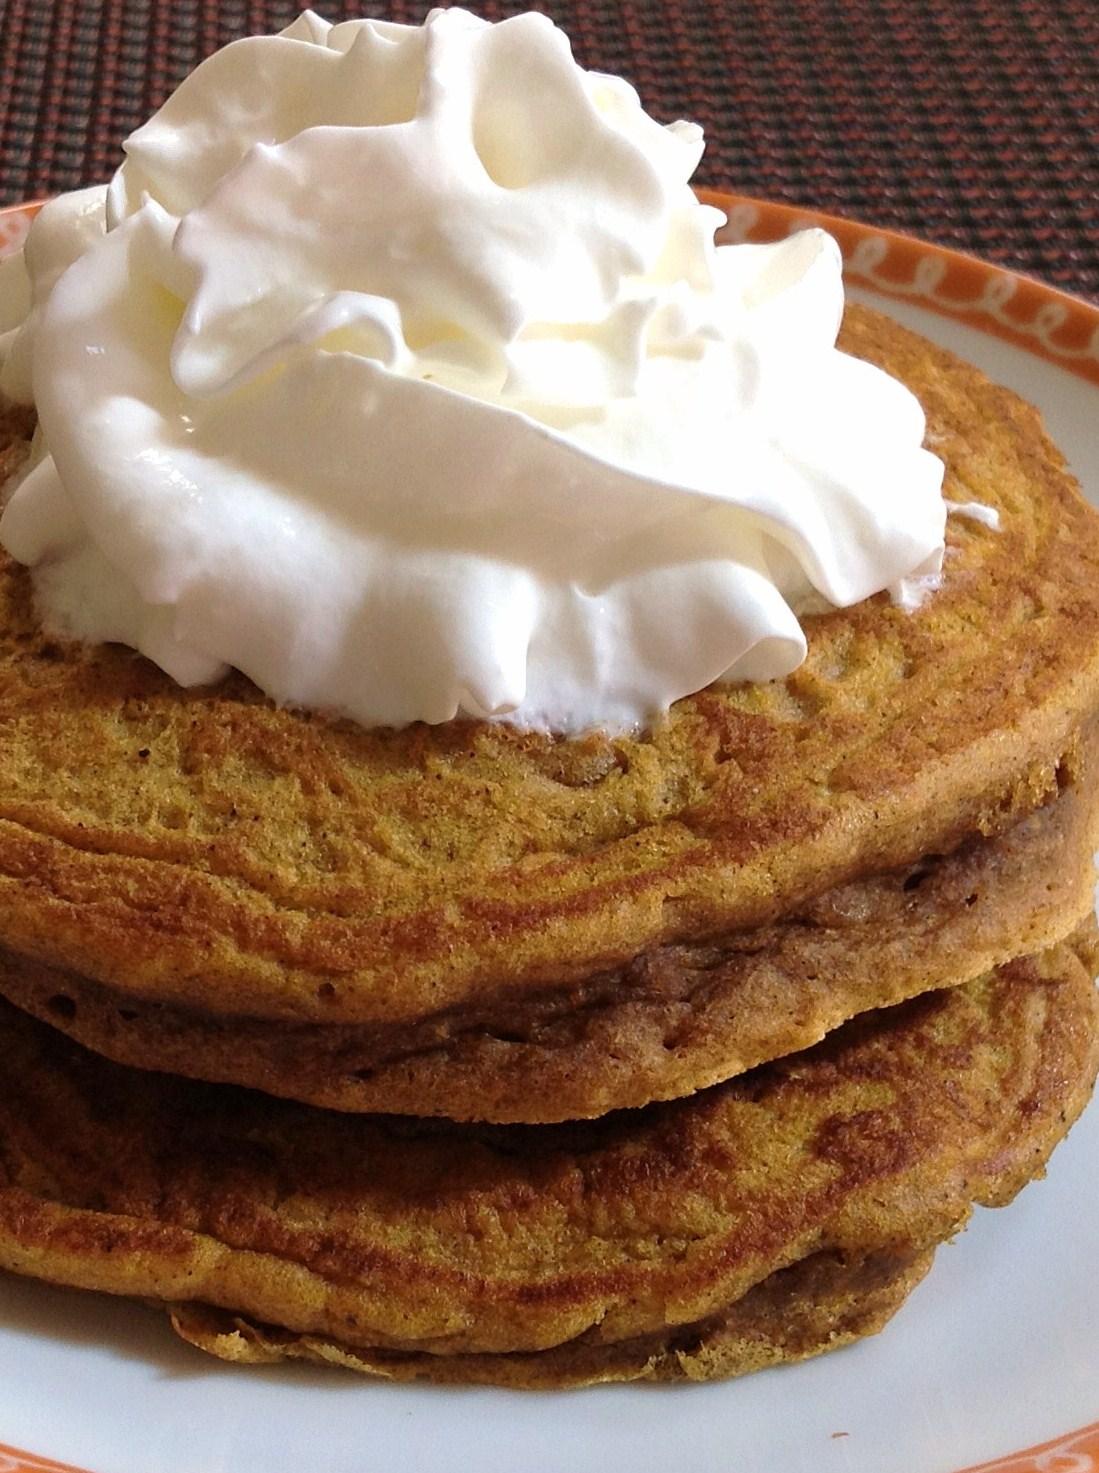 ... pumpkin pancakes lowfat pumpkin pancakes pumpkin pancakes pumpkin pie